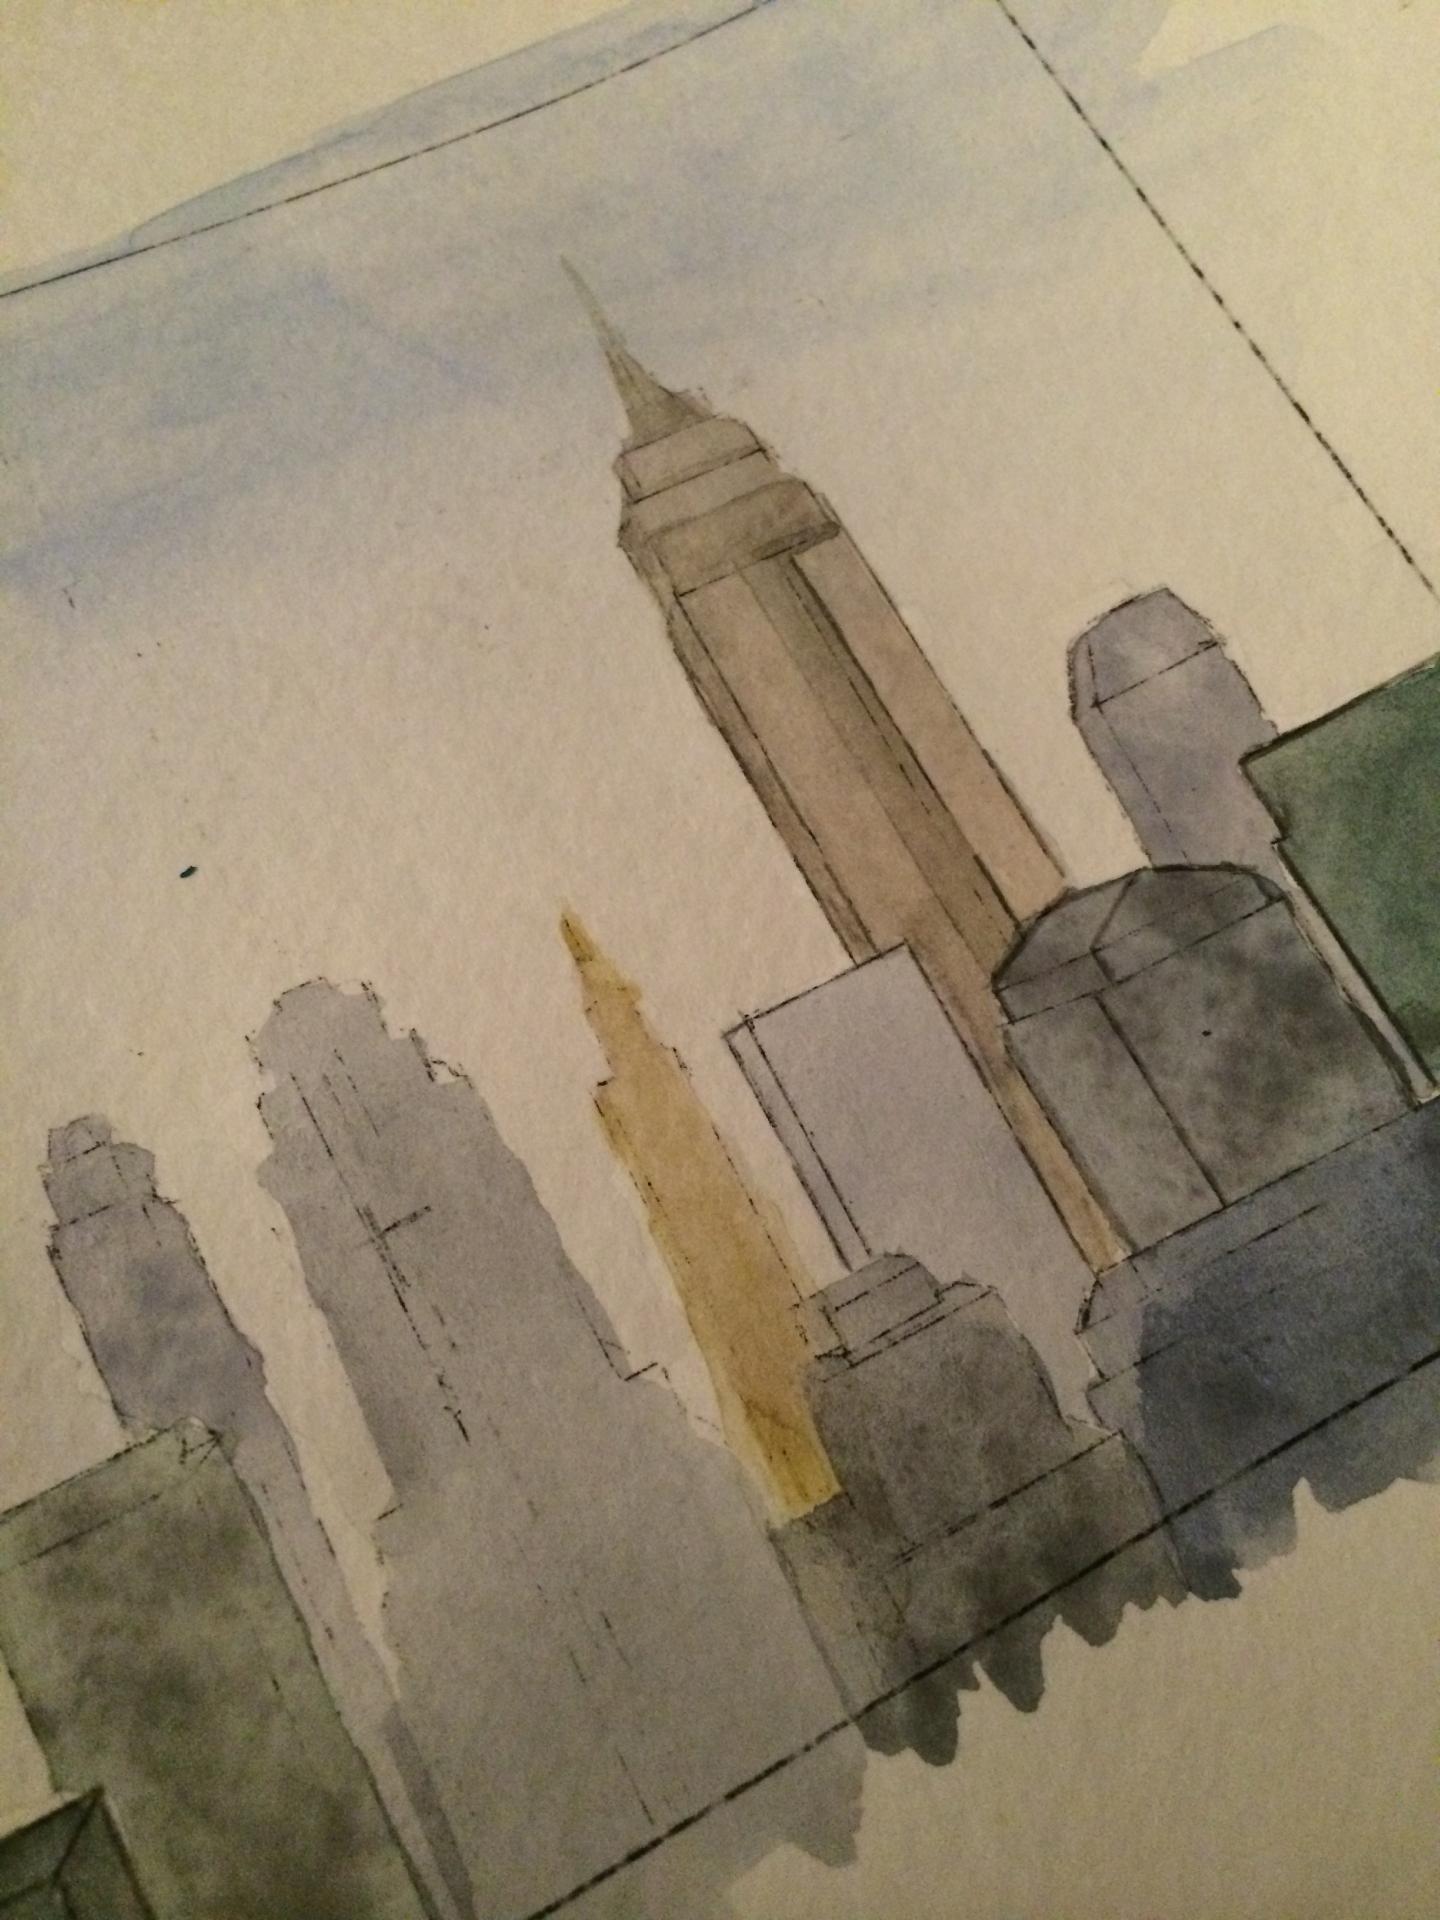 skyline rendering in process